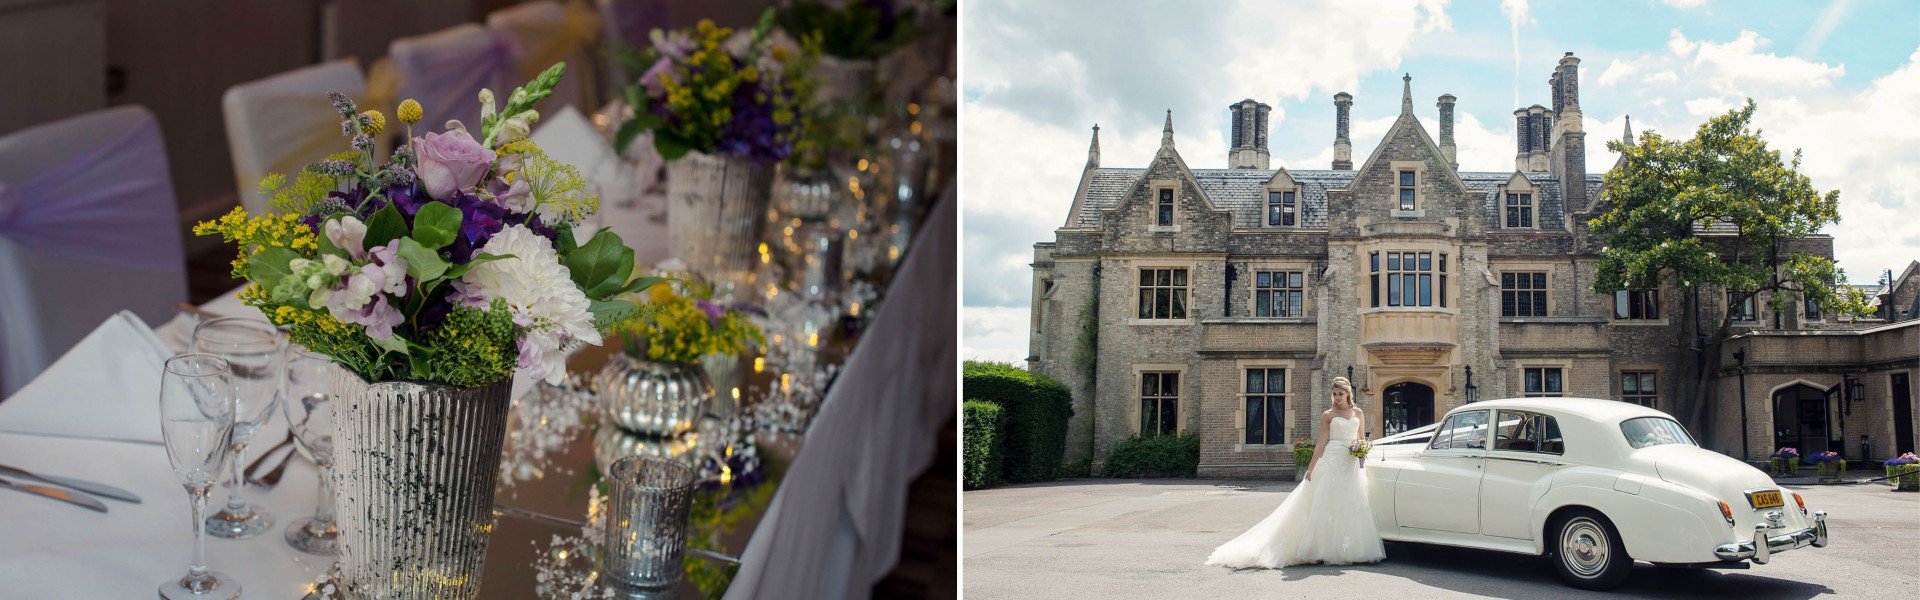 Foxhills Wedding Venue